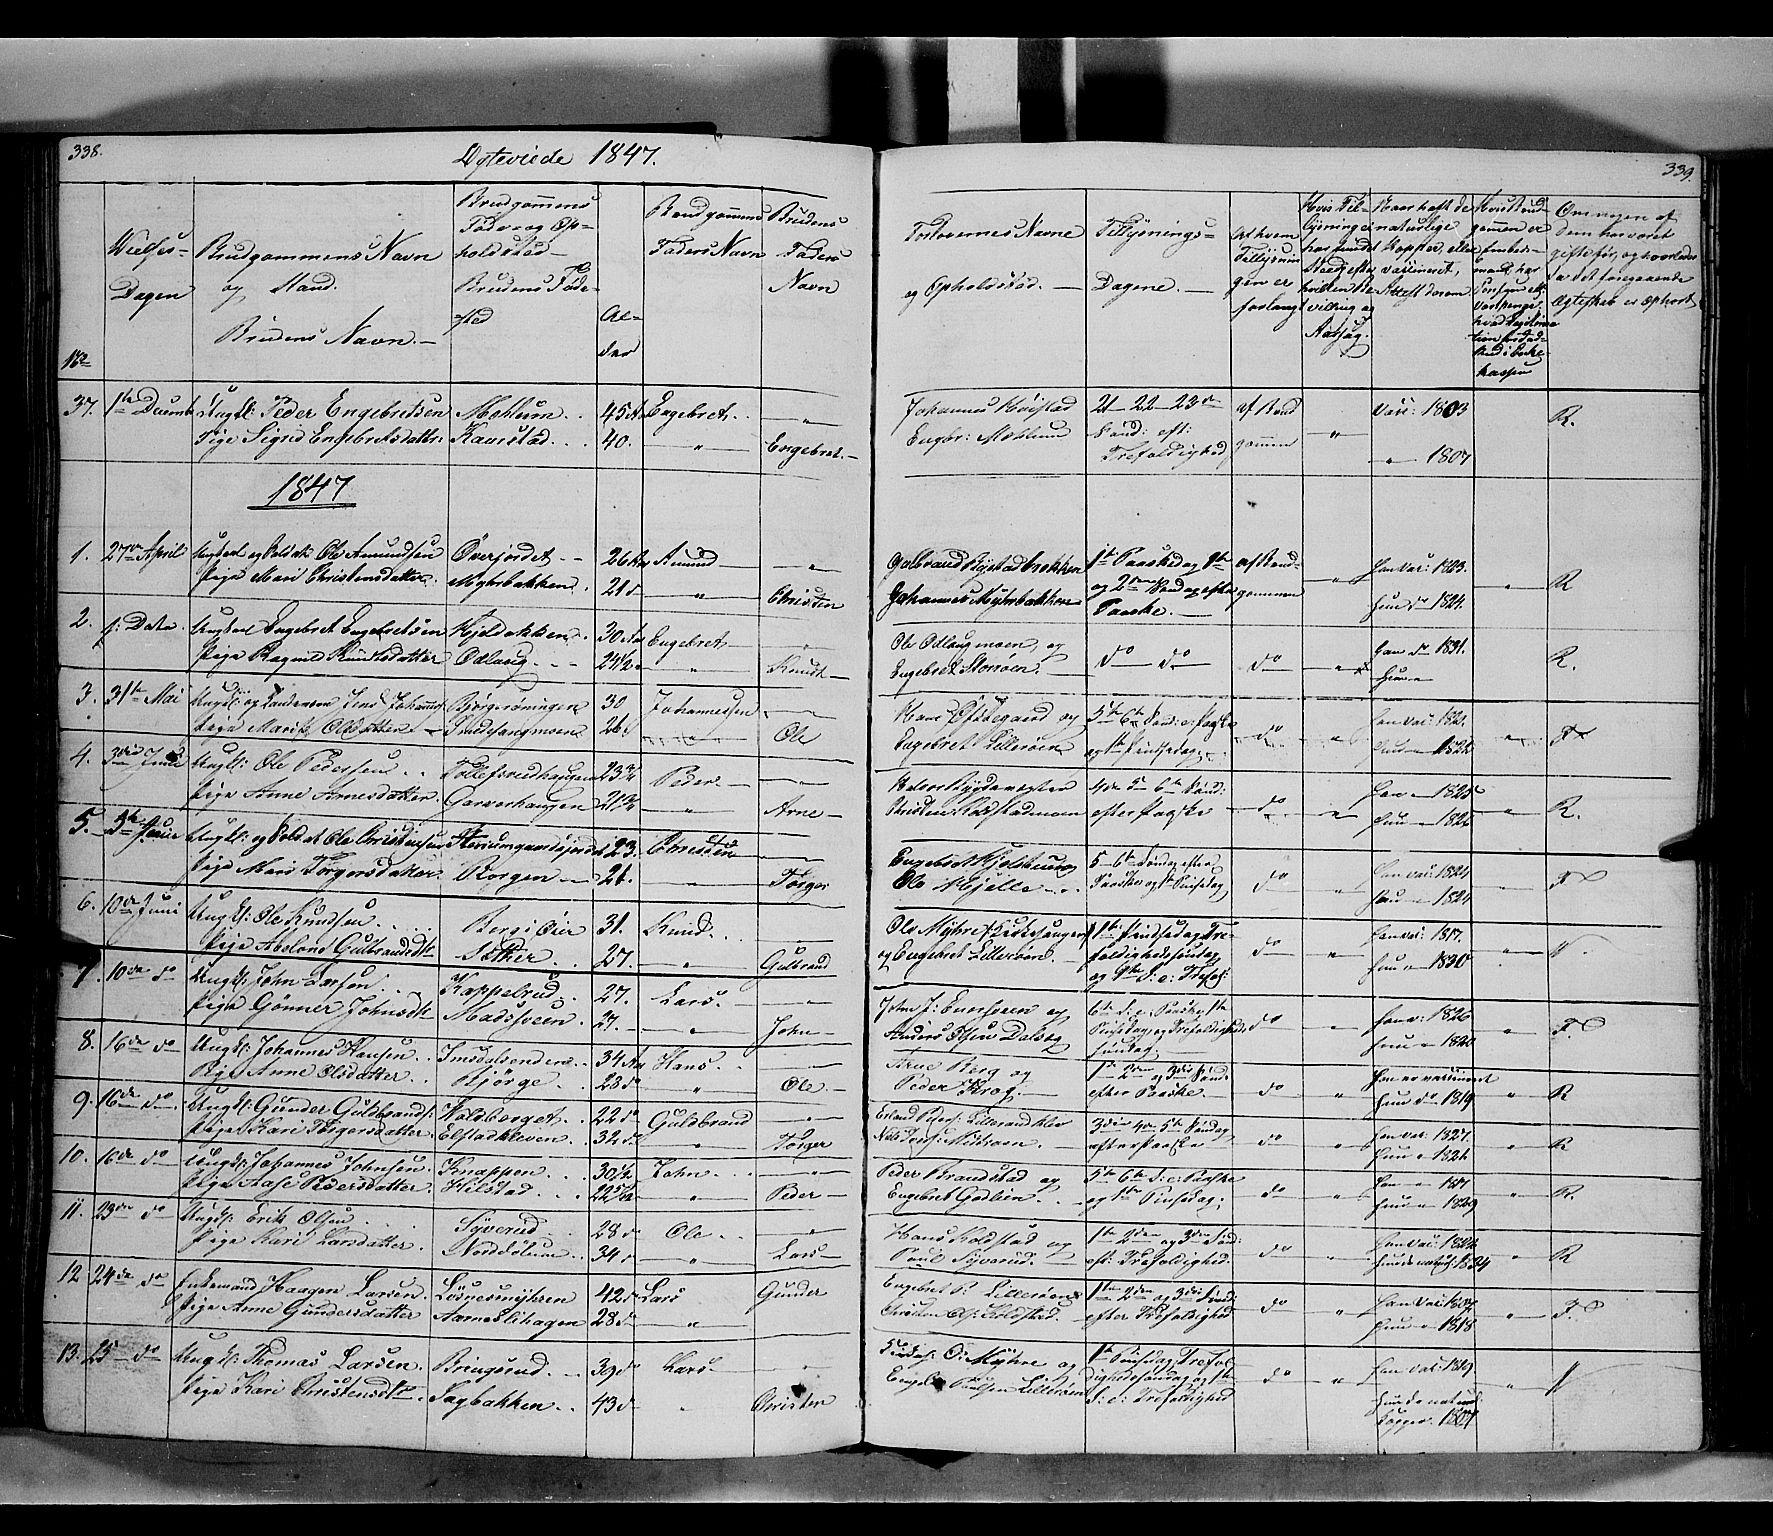 SAH, Ringebu prestekontor, Ministerialbok nr. 5, 1839-1848, s. 338-339